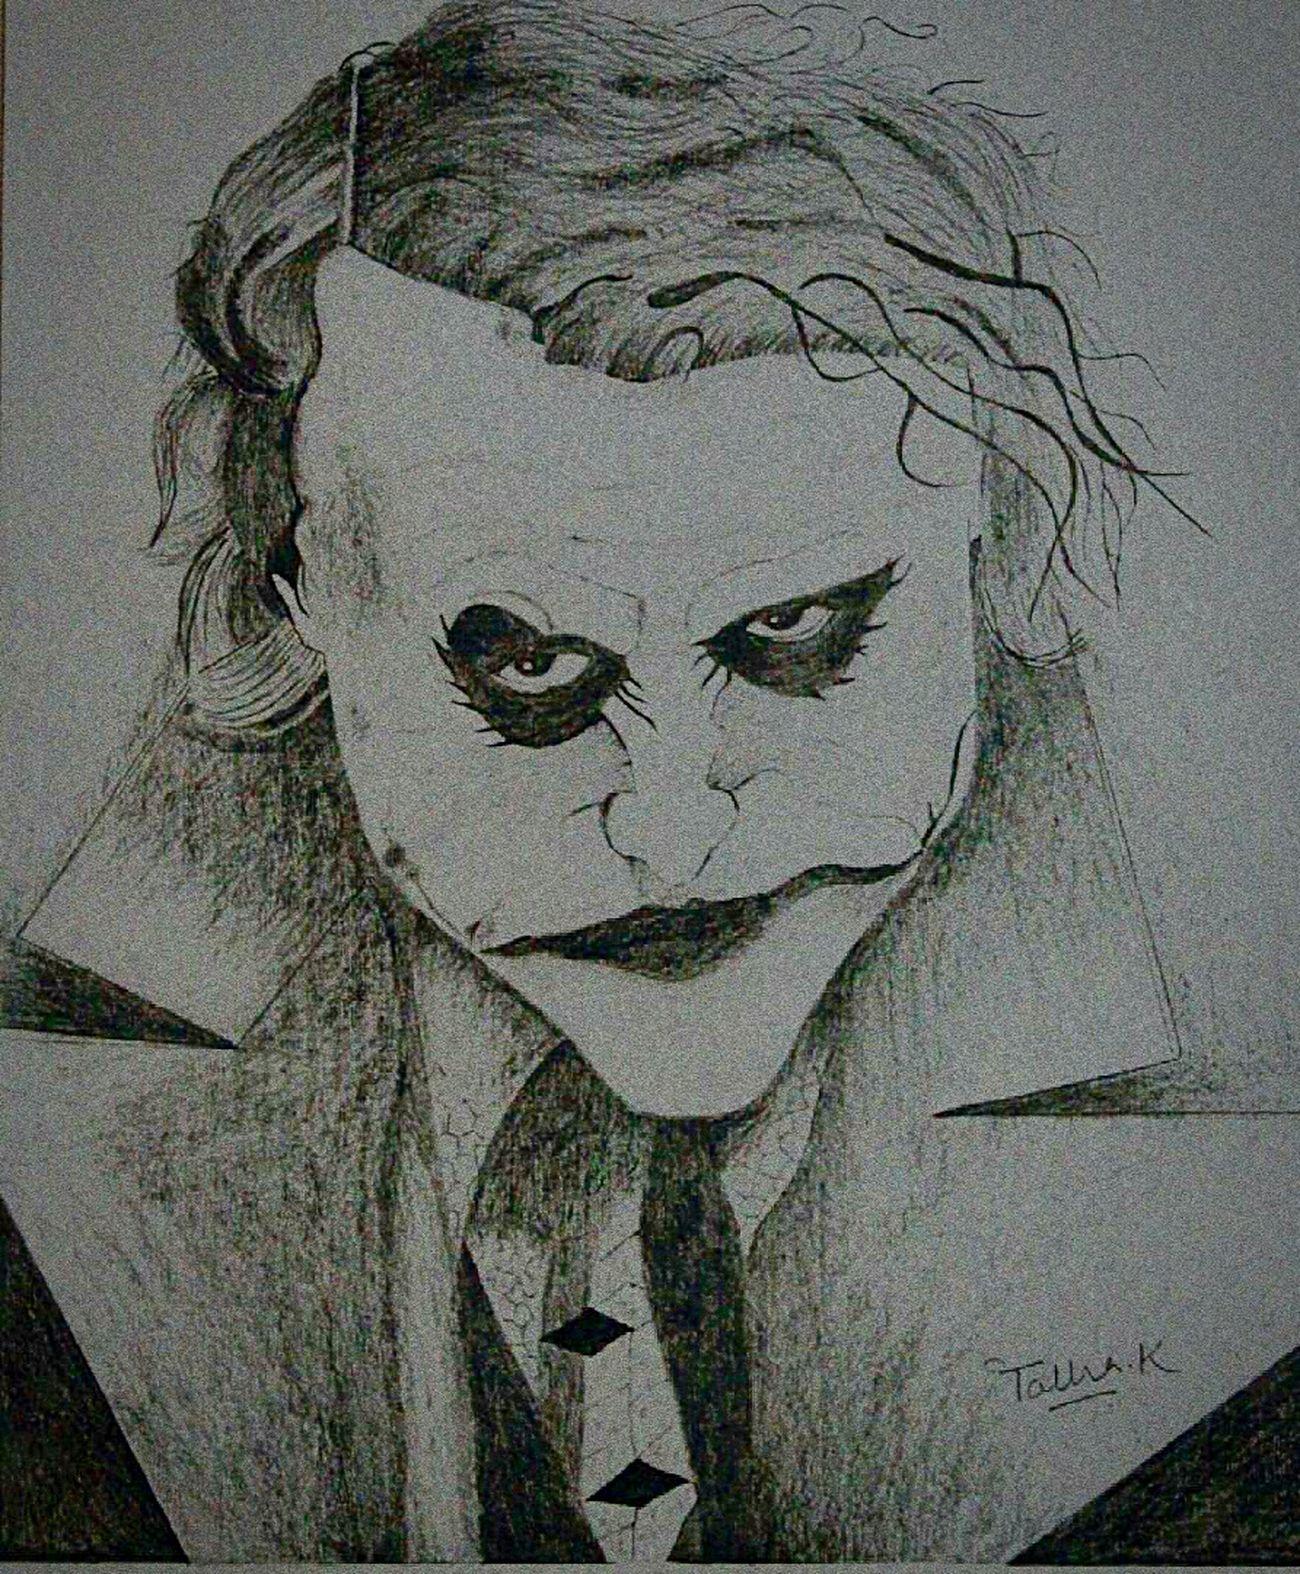 Joker Jokerface Jokersmile Joker ❤️  Jokerdrawing